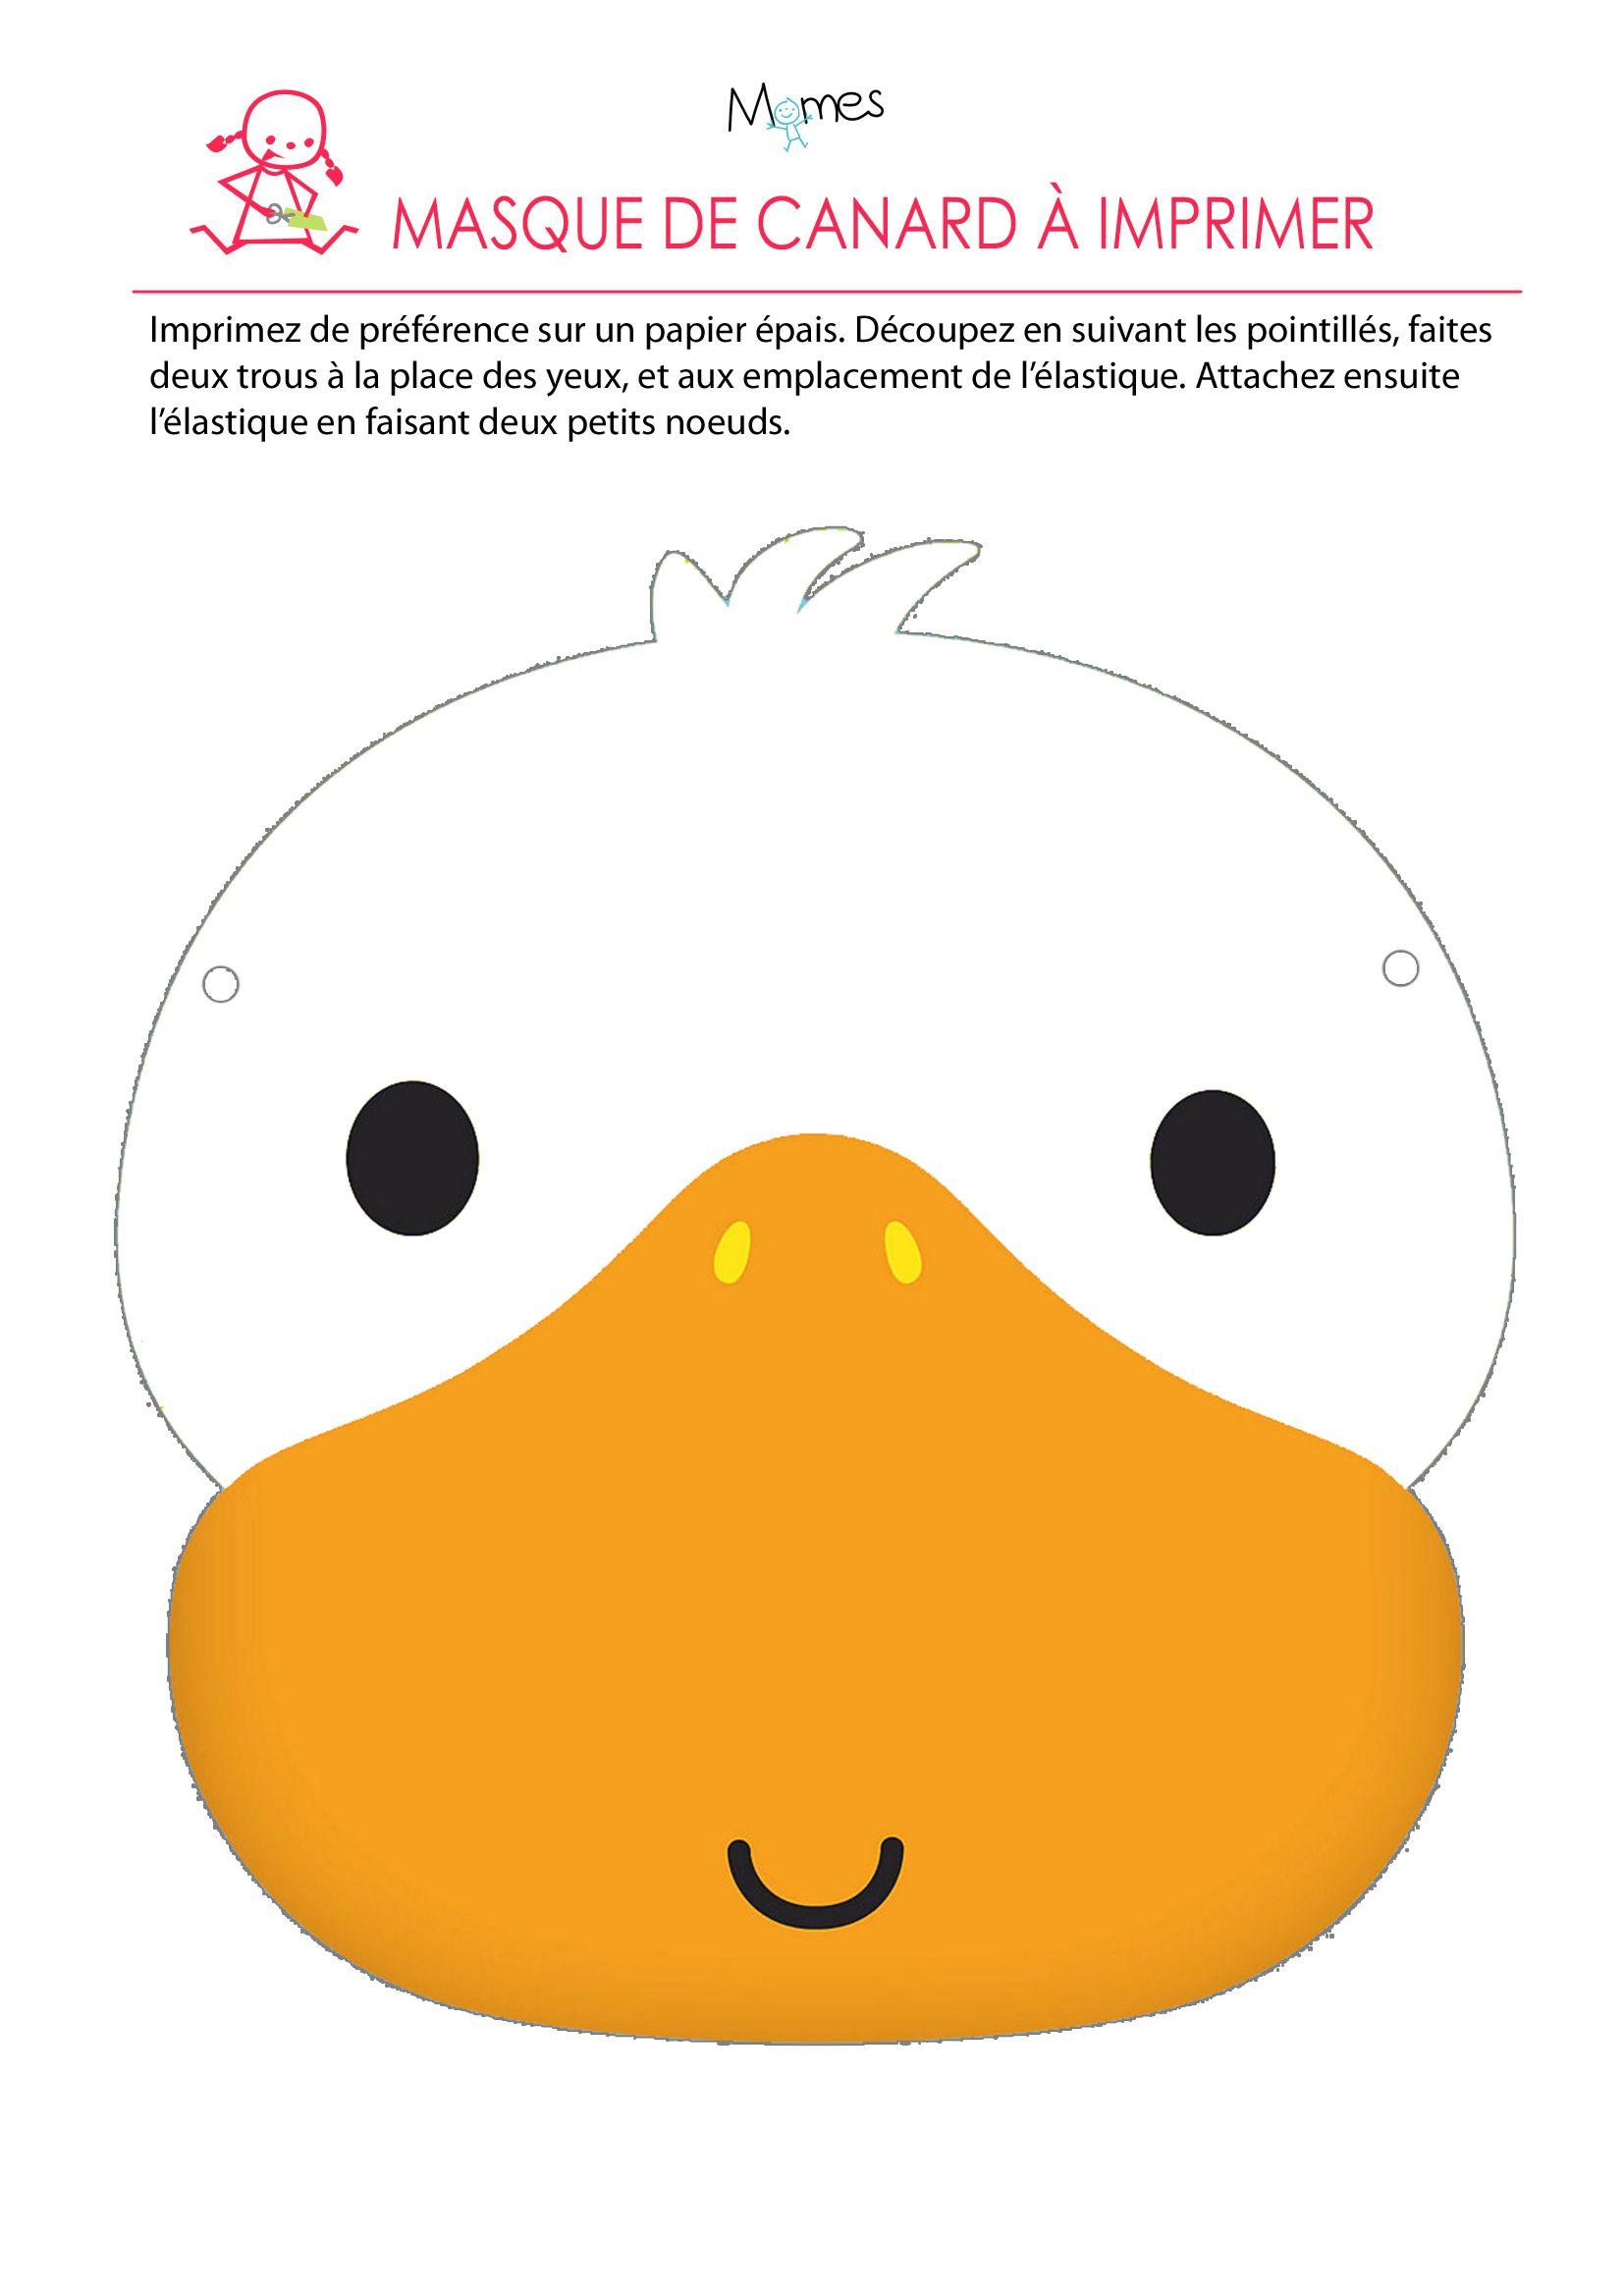 Les Masques Du Carnaval: Le Masque De Canard | Masque De serapportantà Masque Canard À Imprimer